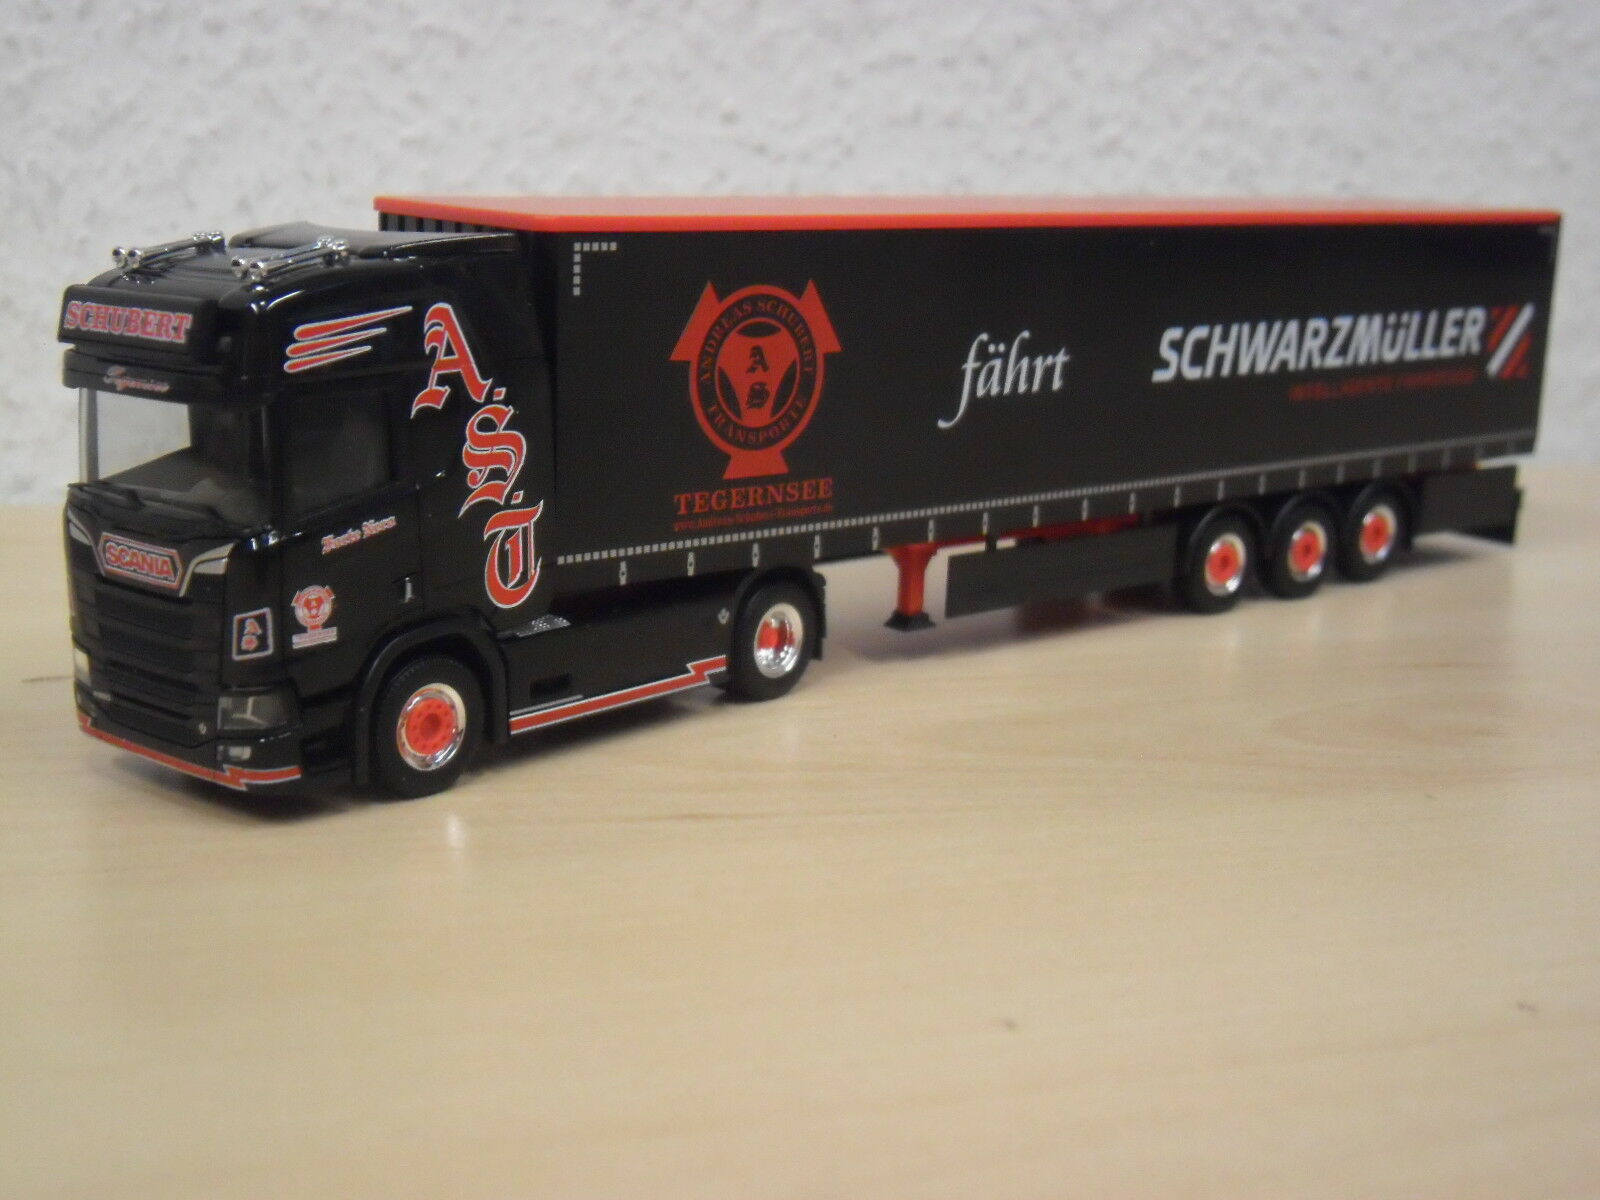 Herpa-Scania CS gaplsz  Schubert Tegernsee-Forte Nero  - 1 933407 - 1 - 87 c24274